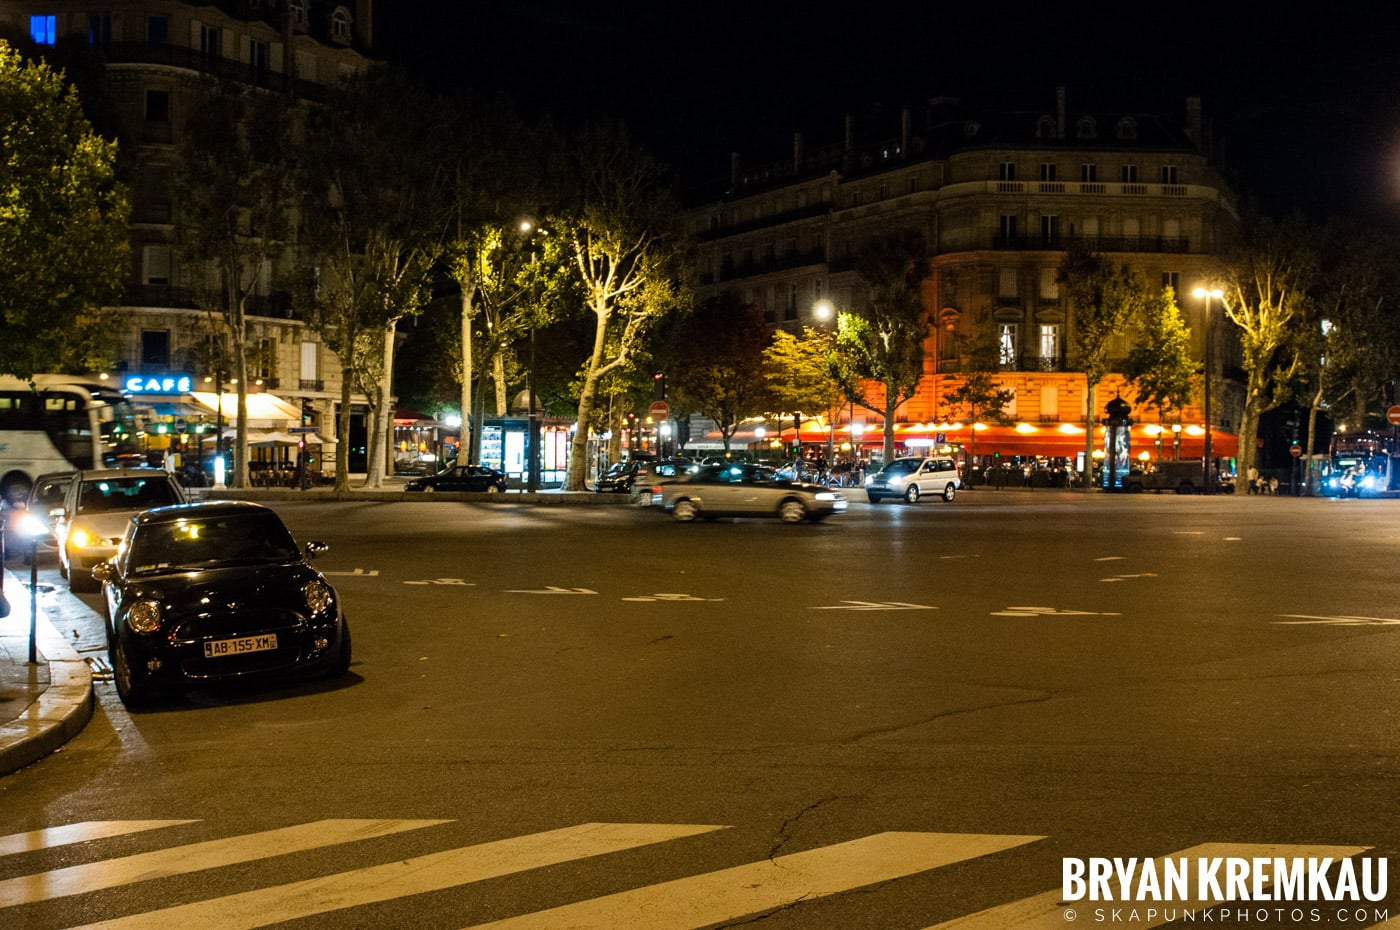 Paris, France Honeymoon - Day 5 - 7.22.11 (2)